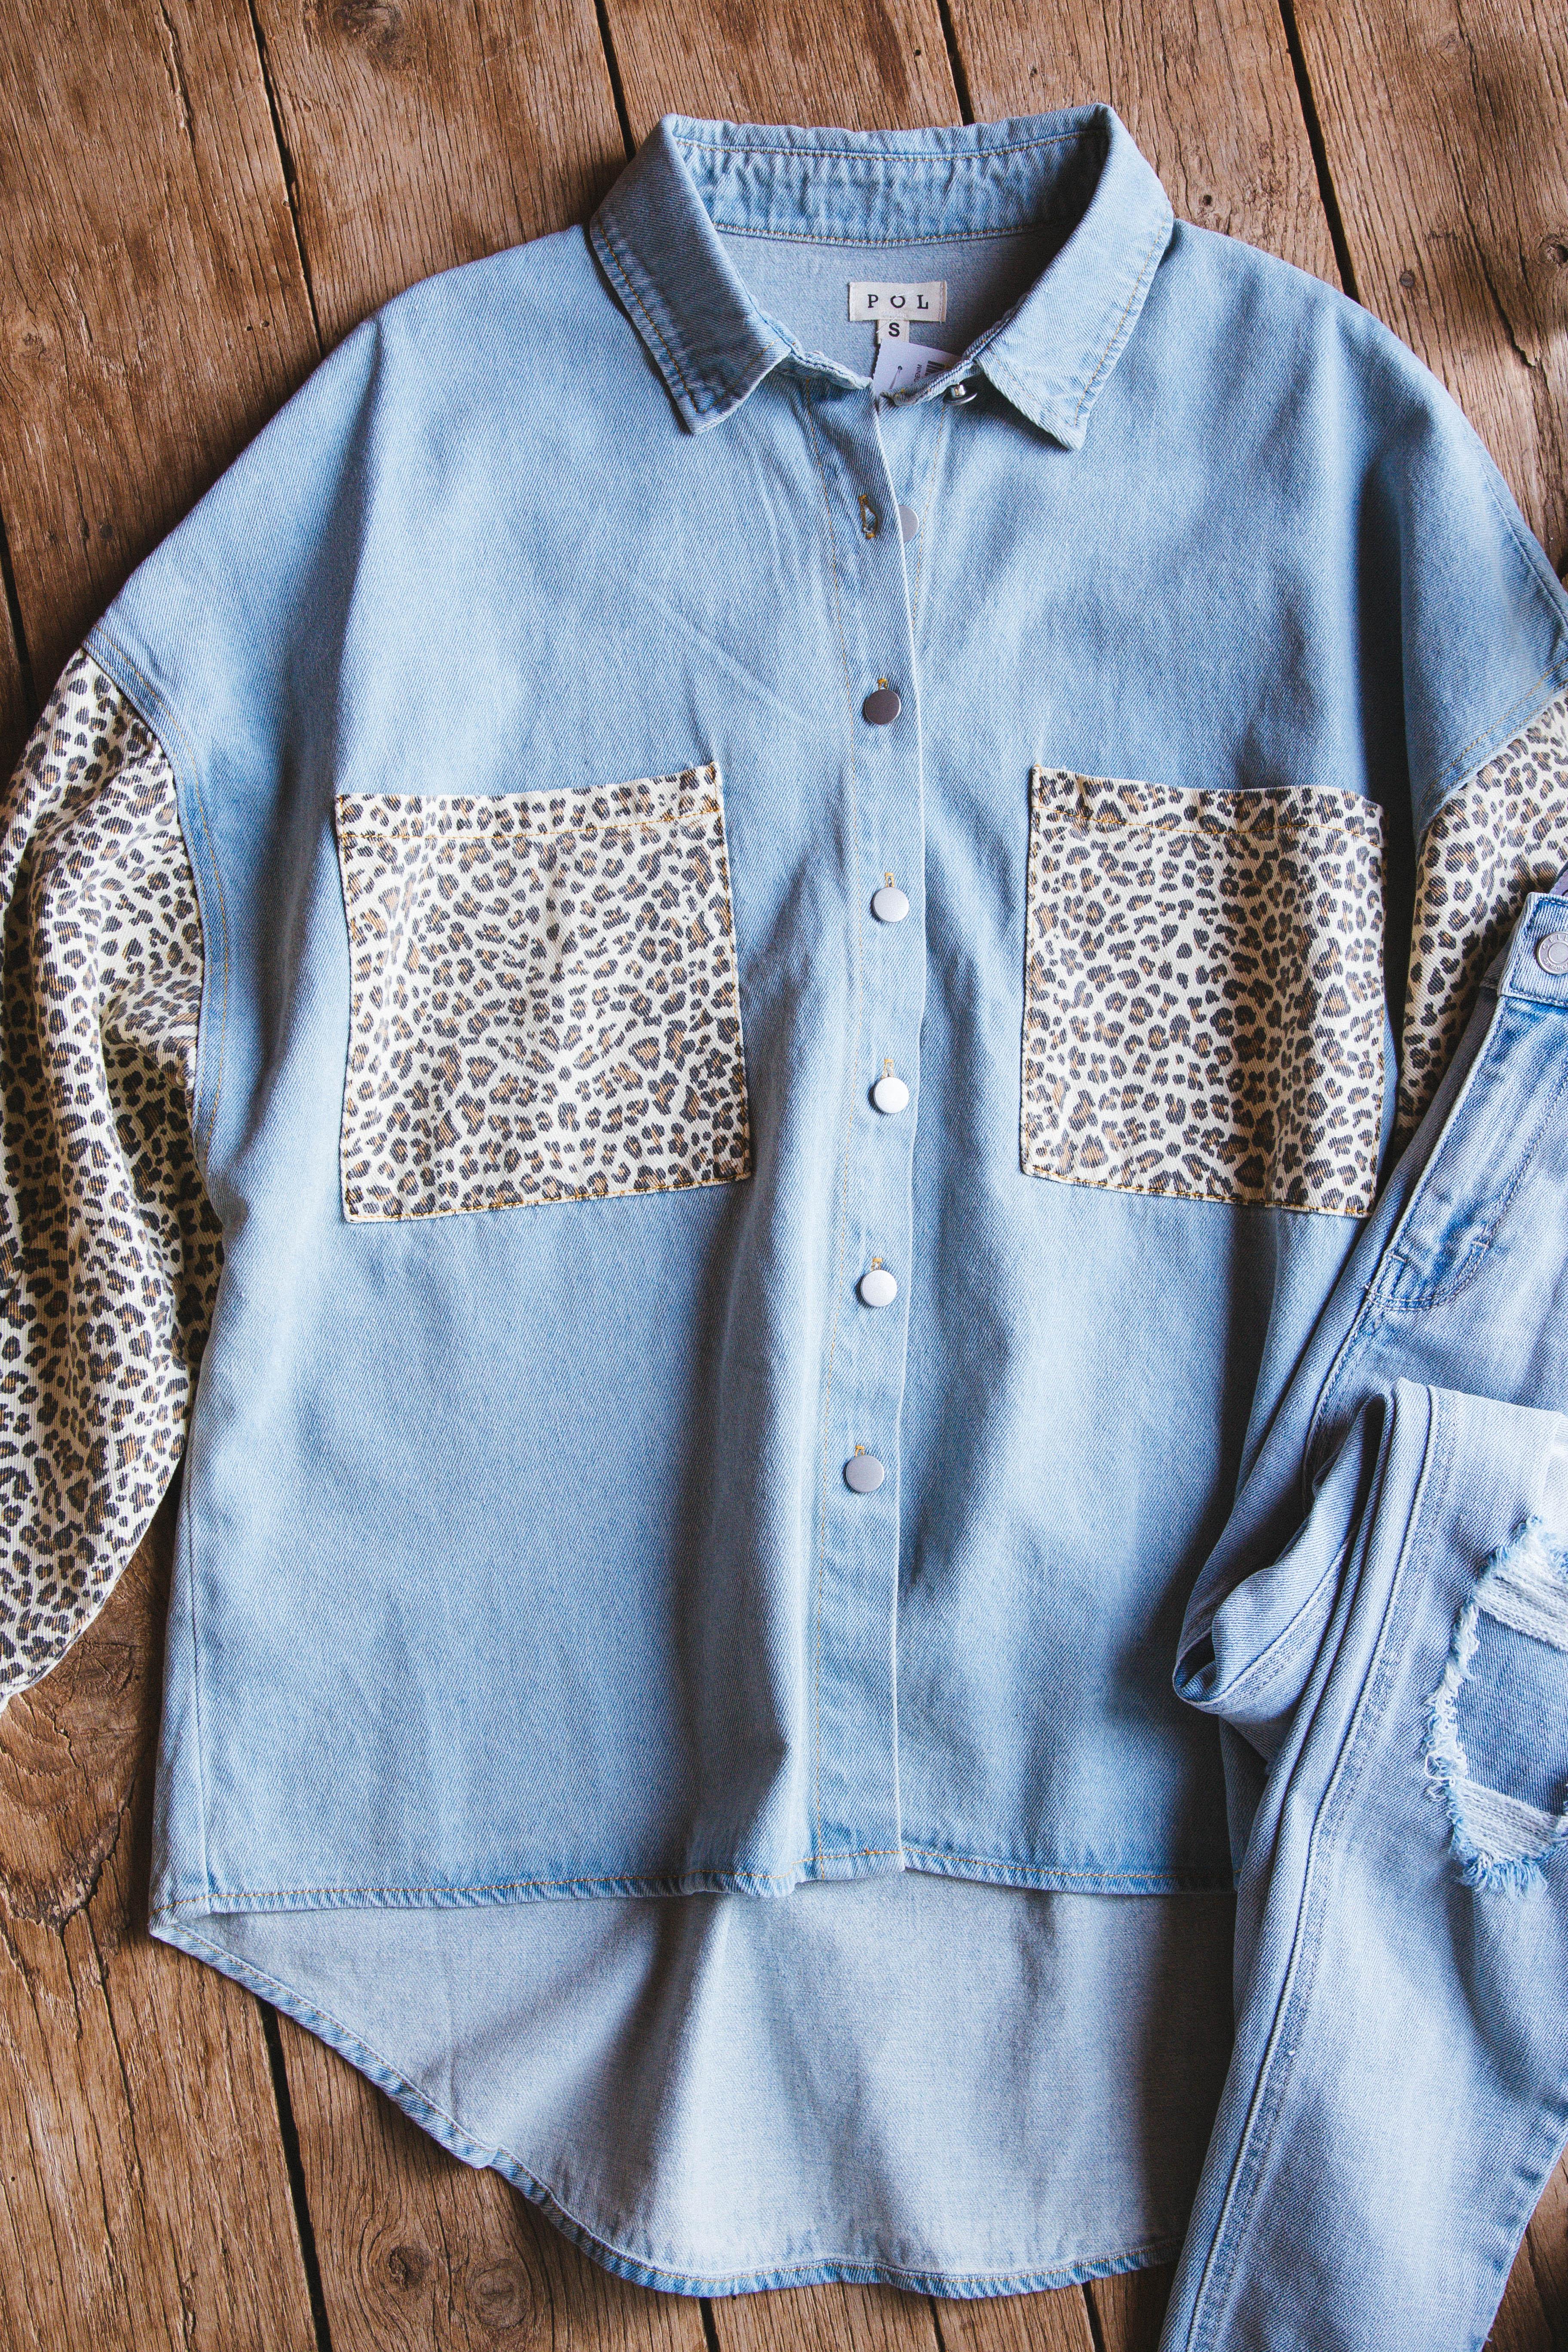 POL Clothing Inc. Erika Leopard Mix Jacket Light Denim   Extended Sizes Available